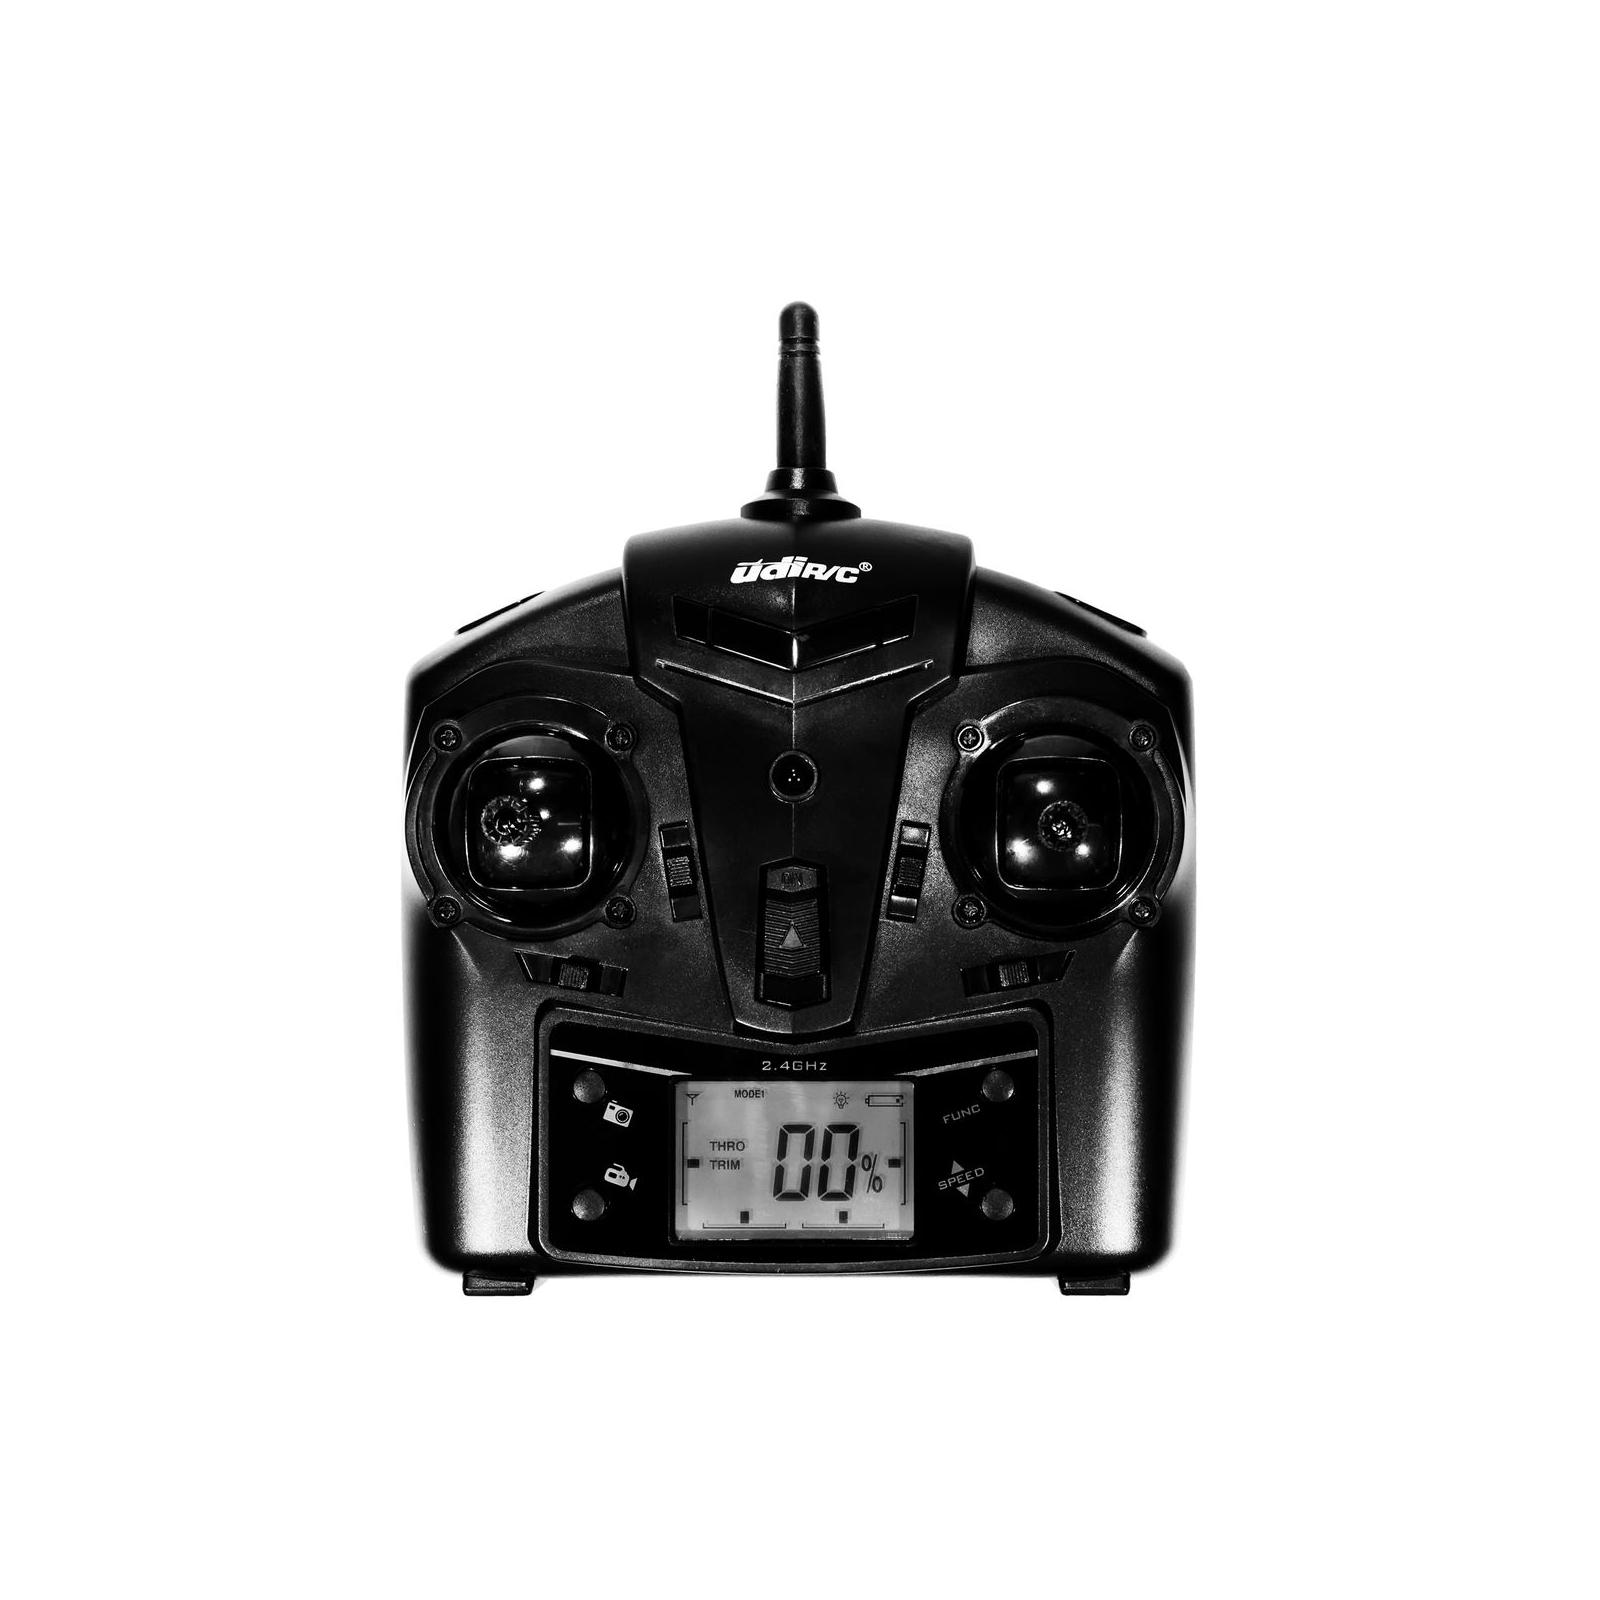 Квадрокоптер UDIRC U842 FALCON 2,4 GHz 486 мм HD бортовая камера 4CH (U842 Black) изображение 5